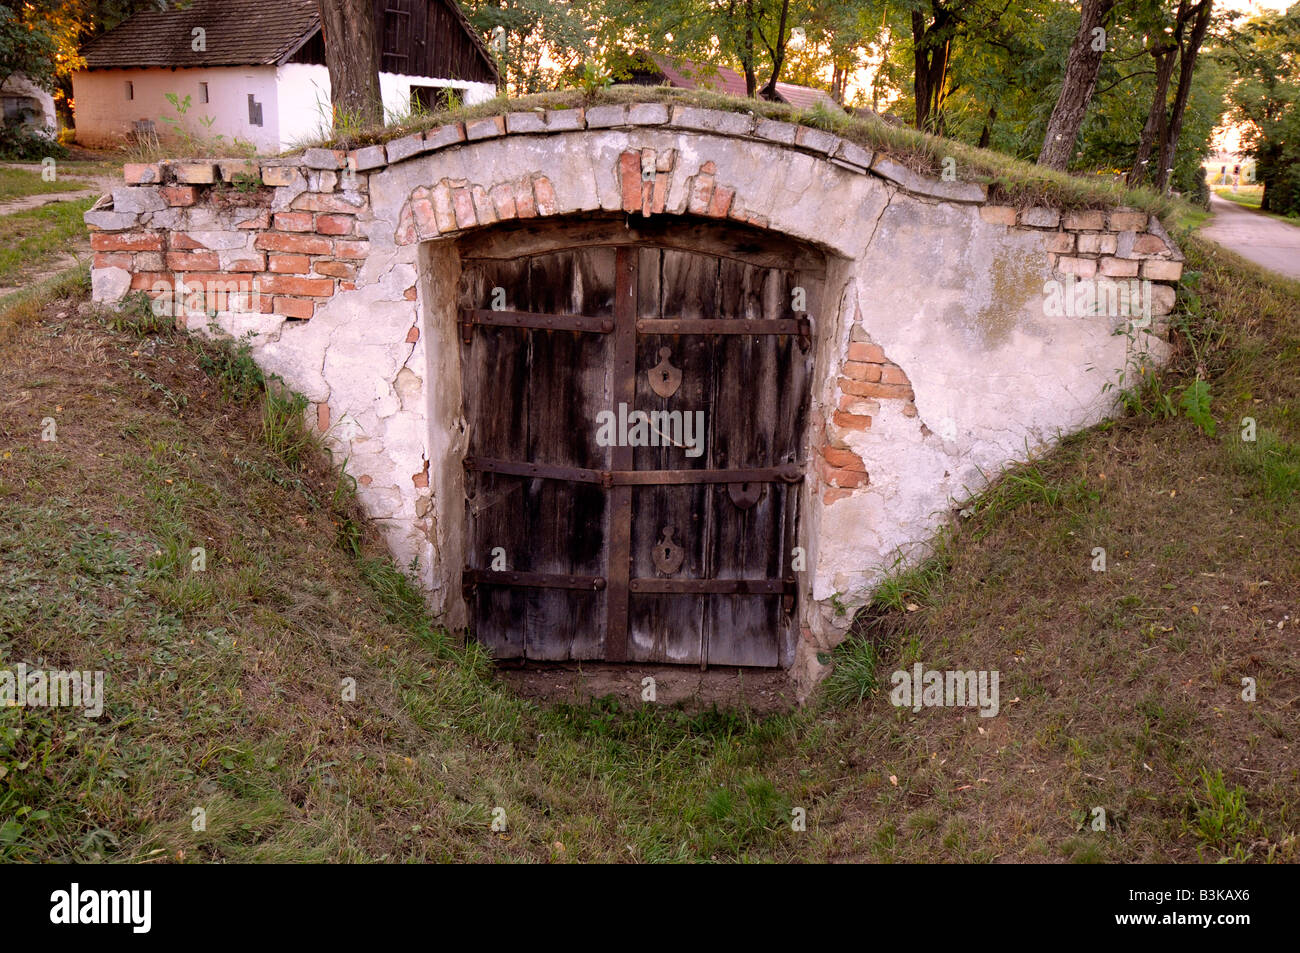 Wine cellar, 'Press Haus' or 'wine press house' in Austria - Stock Image